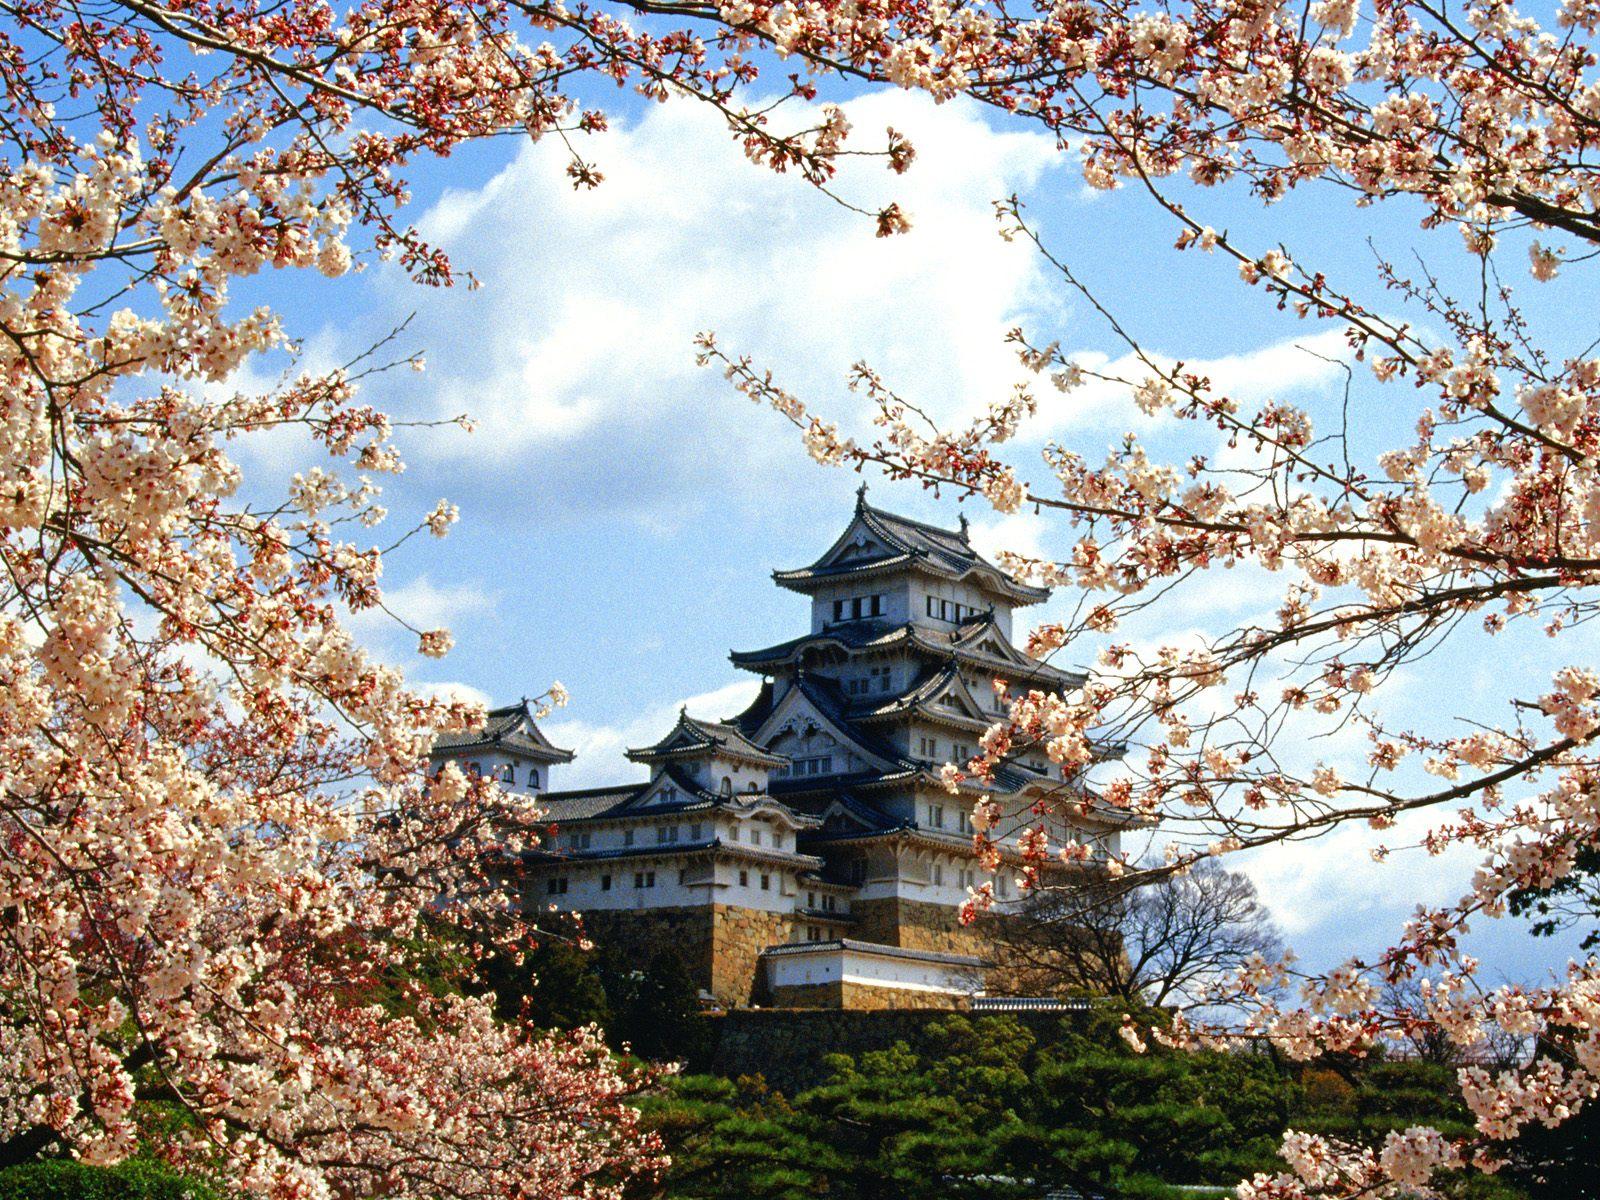 http://1.bp.blogspot.com/-ERefKkktlUw/TVPxK7LE0GI/AAAAAAAAB4Q/uaQ5BFLbpew/s1600/Himeji-jo+Castle%252C+Himeji%252C+Kinki%252C+Japan.jpg